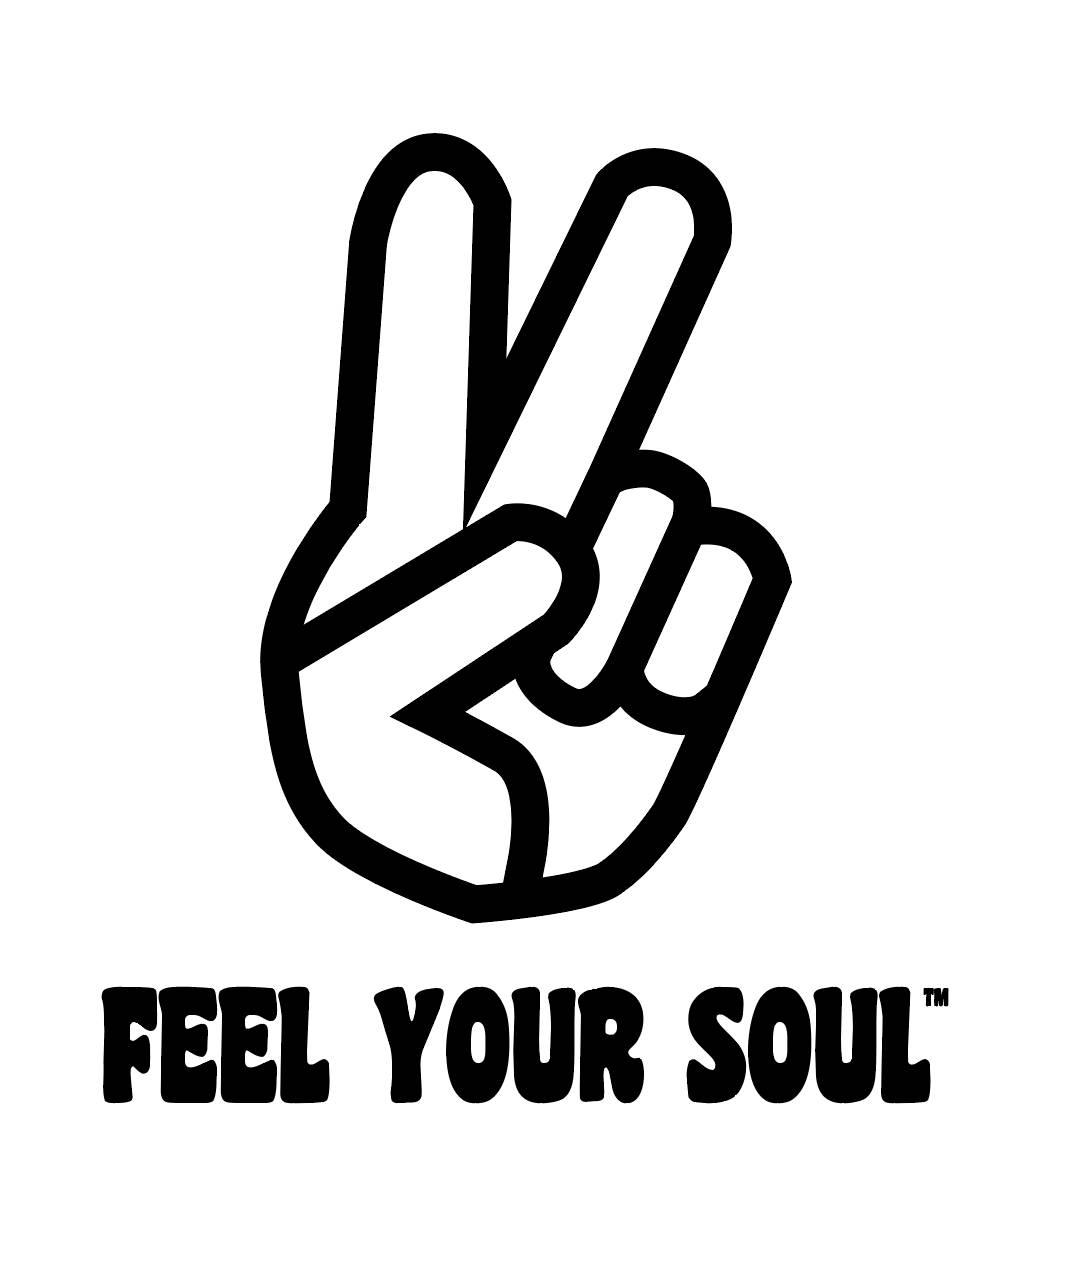 Feel Your Soul Footsouls